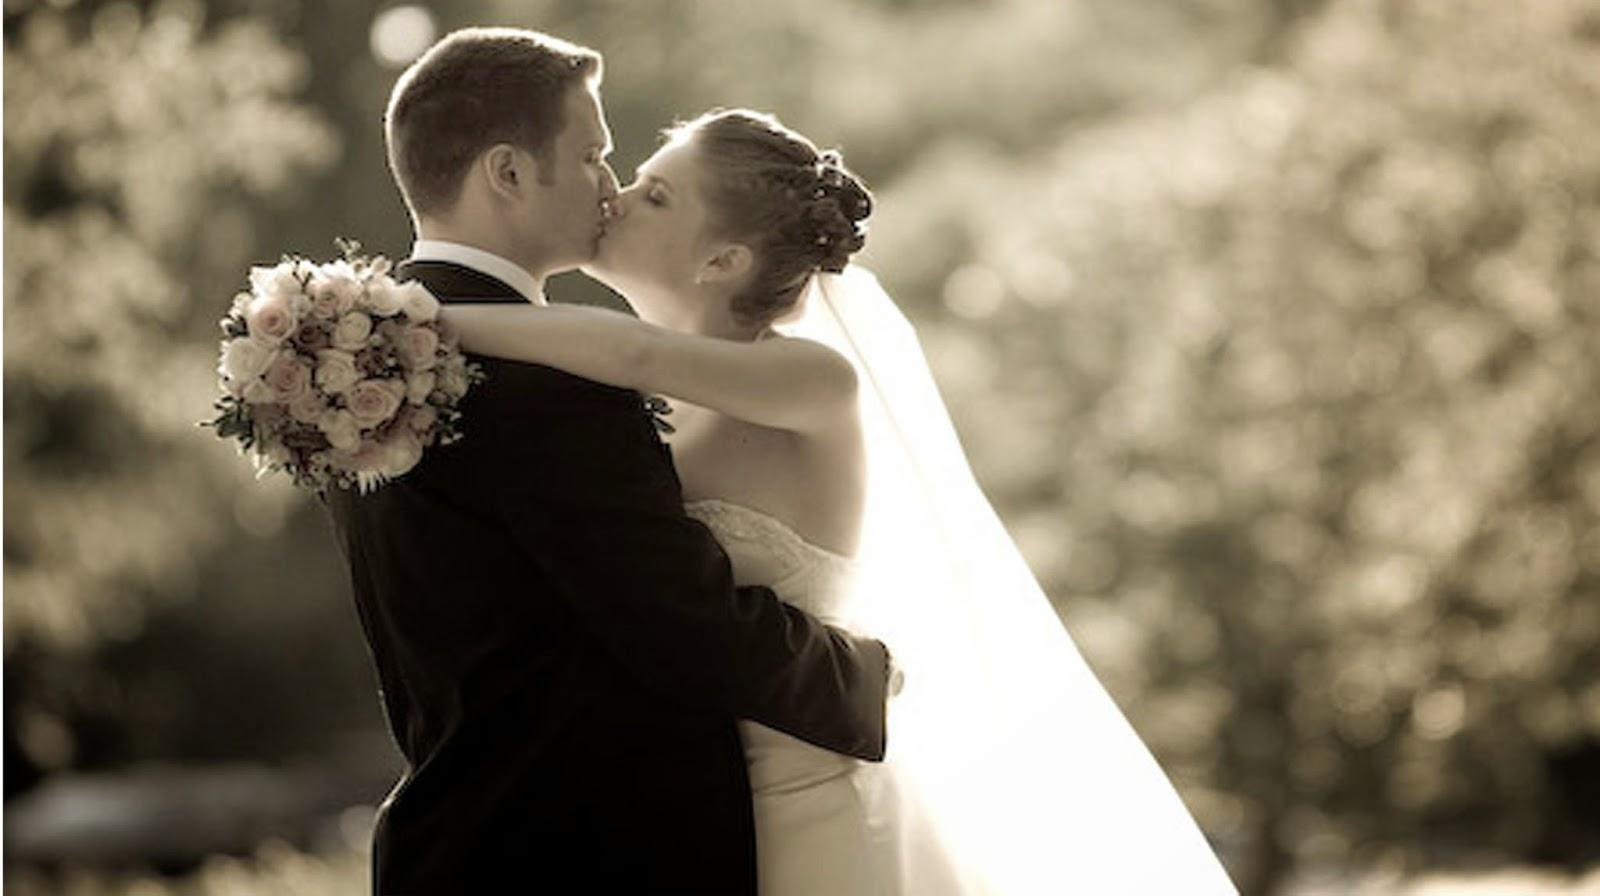 Its romantic wedding kiss - Romantic wedding wallpaper